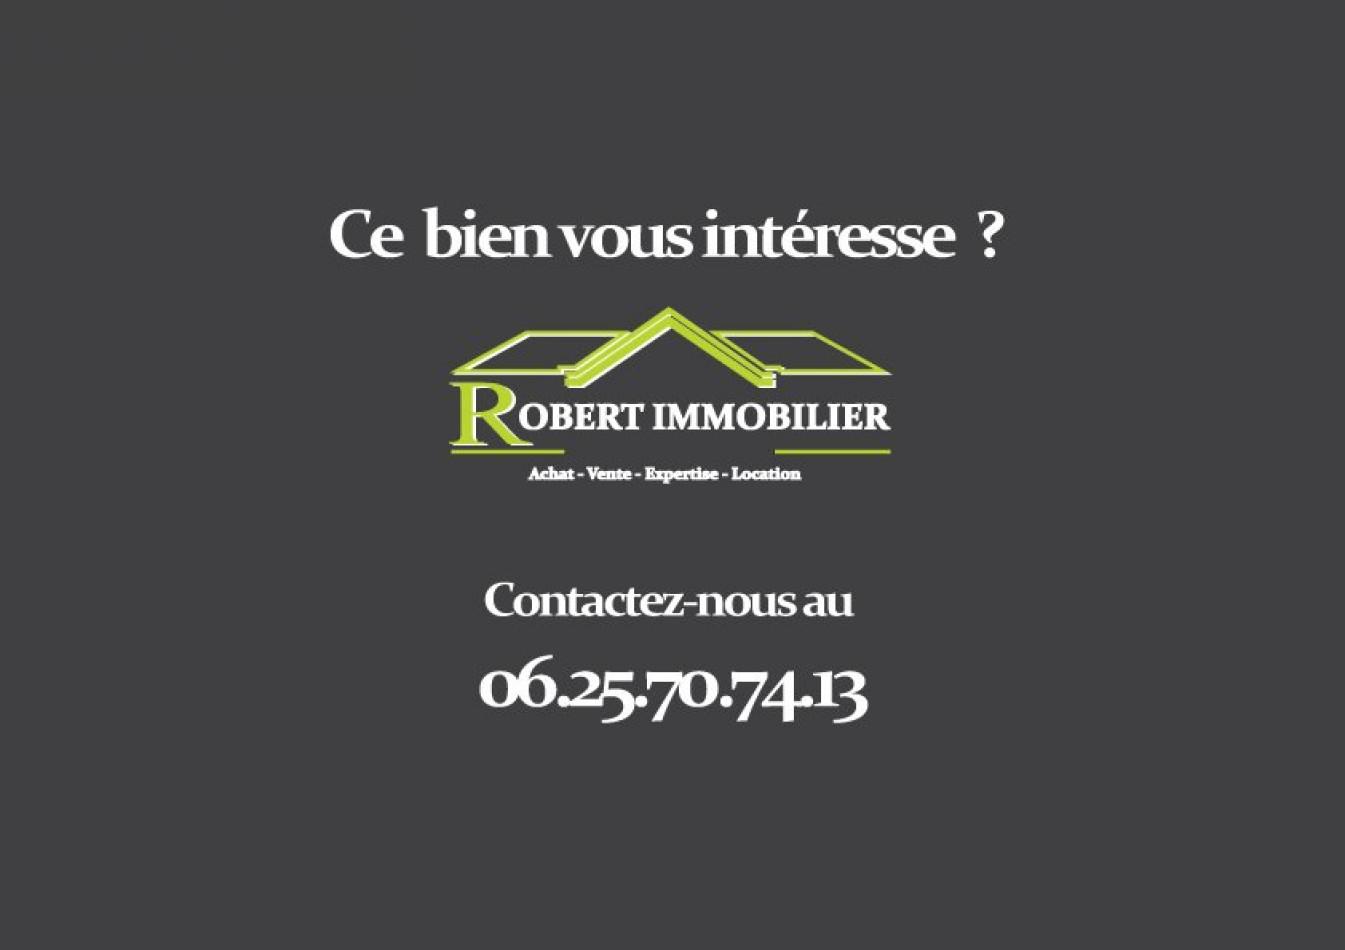 A vendre  Agde   Réf 345514399 - Robert immobilier